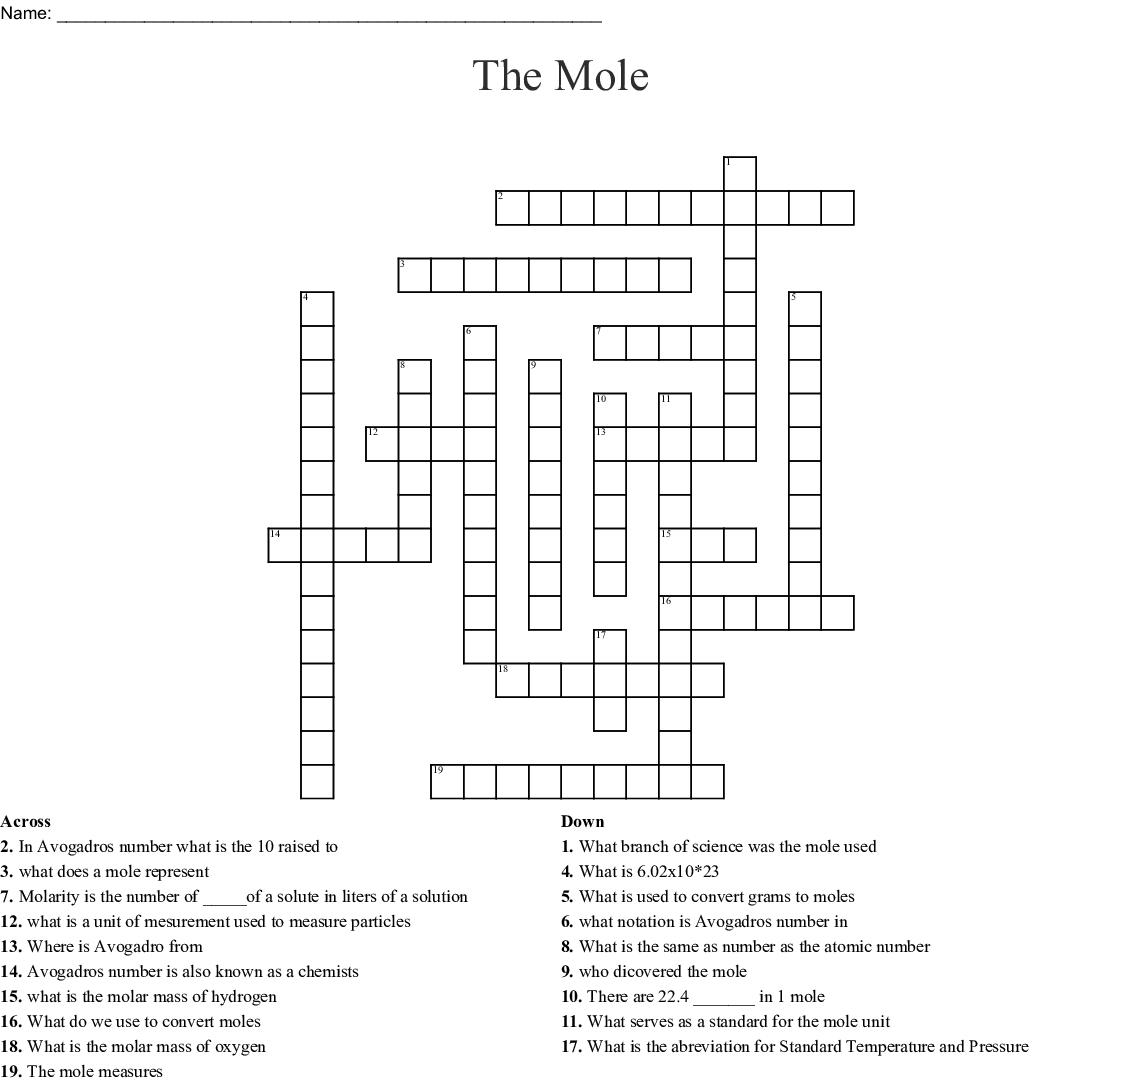 Mole Day Crossword Puzzle